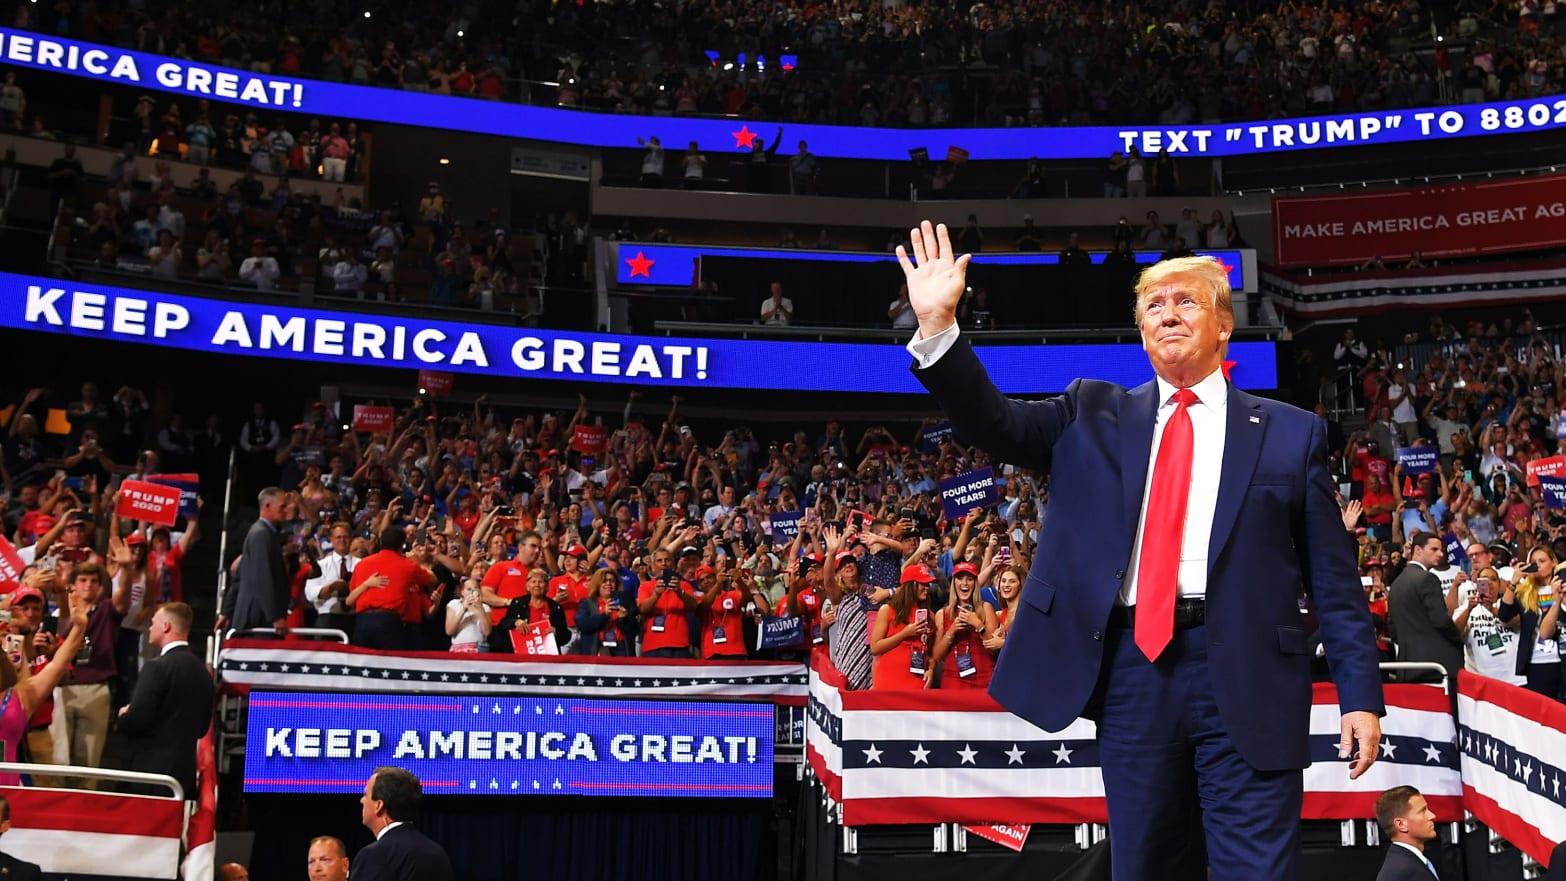 Trump's Orlando 2020 Presidential Campaign Launch Speech: Donald 1, Hillary 0